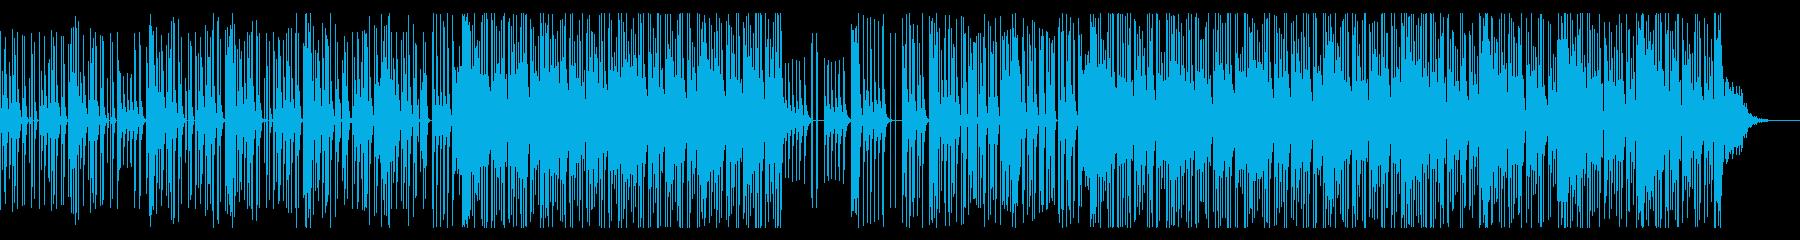 80's風テクノBGMの再生済みの波形